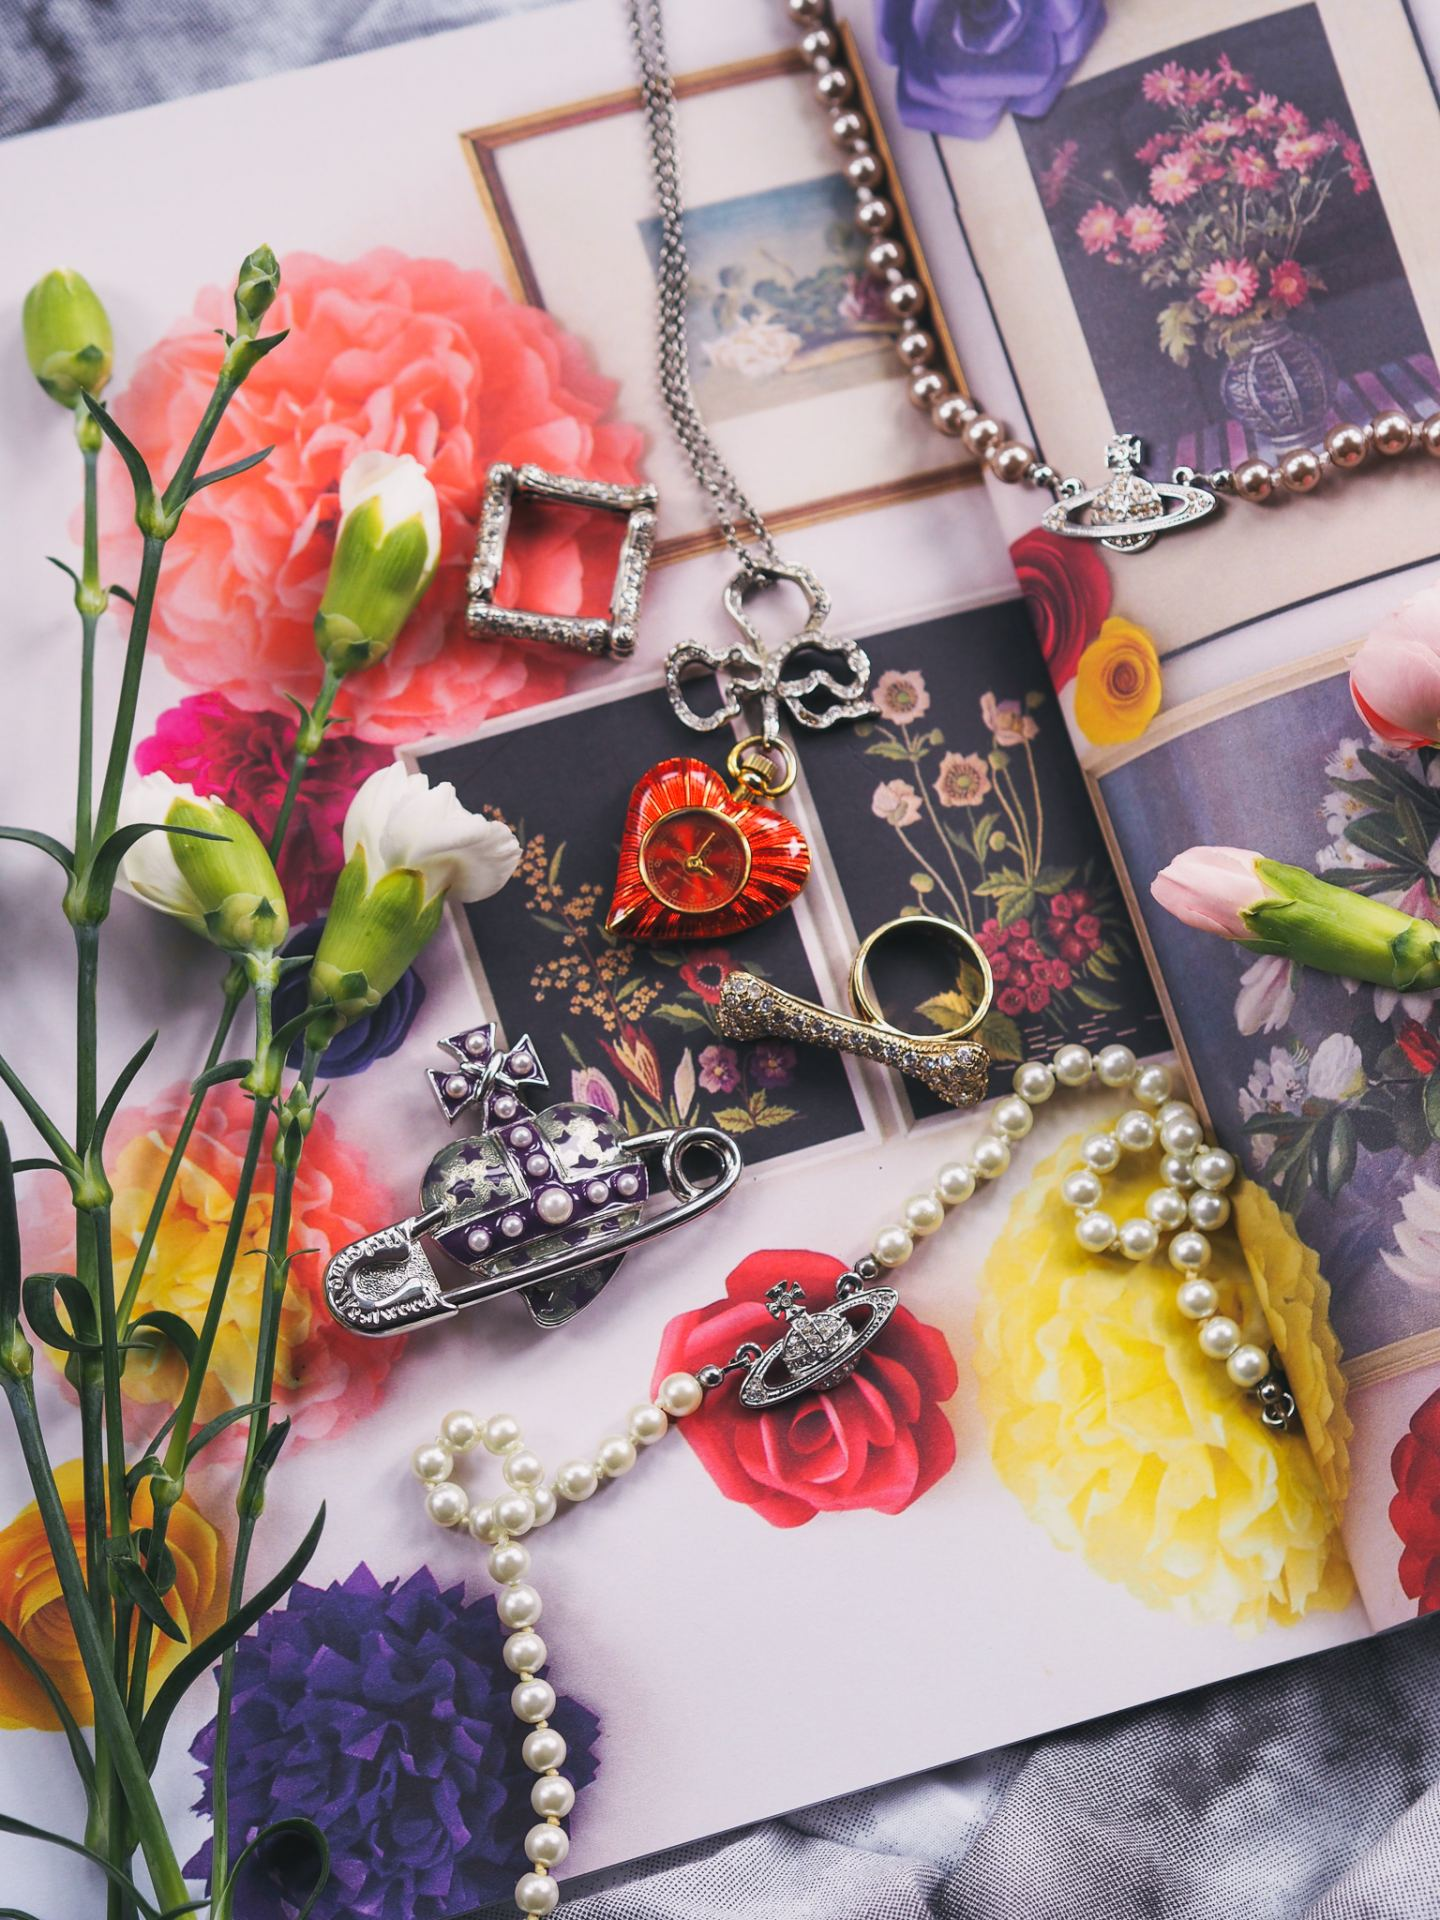 vivienne westwood watch necklace heart sacred pendant necklace